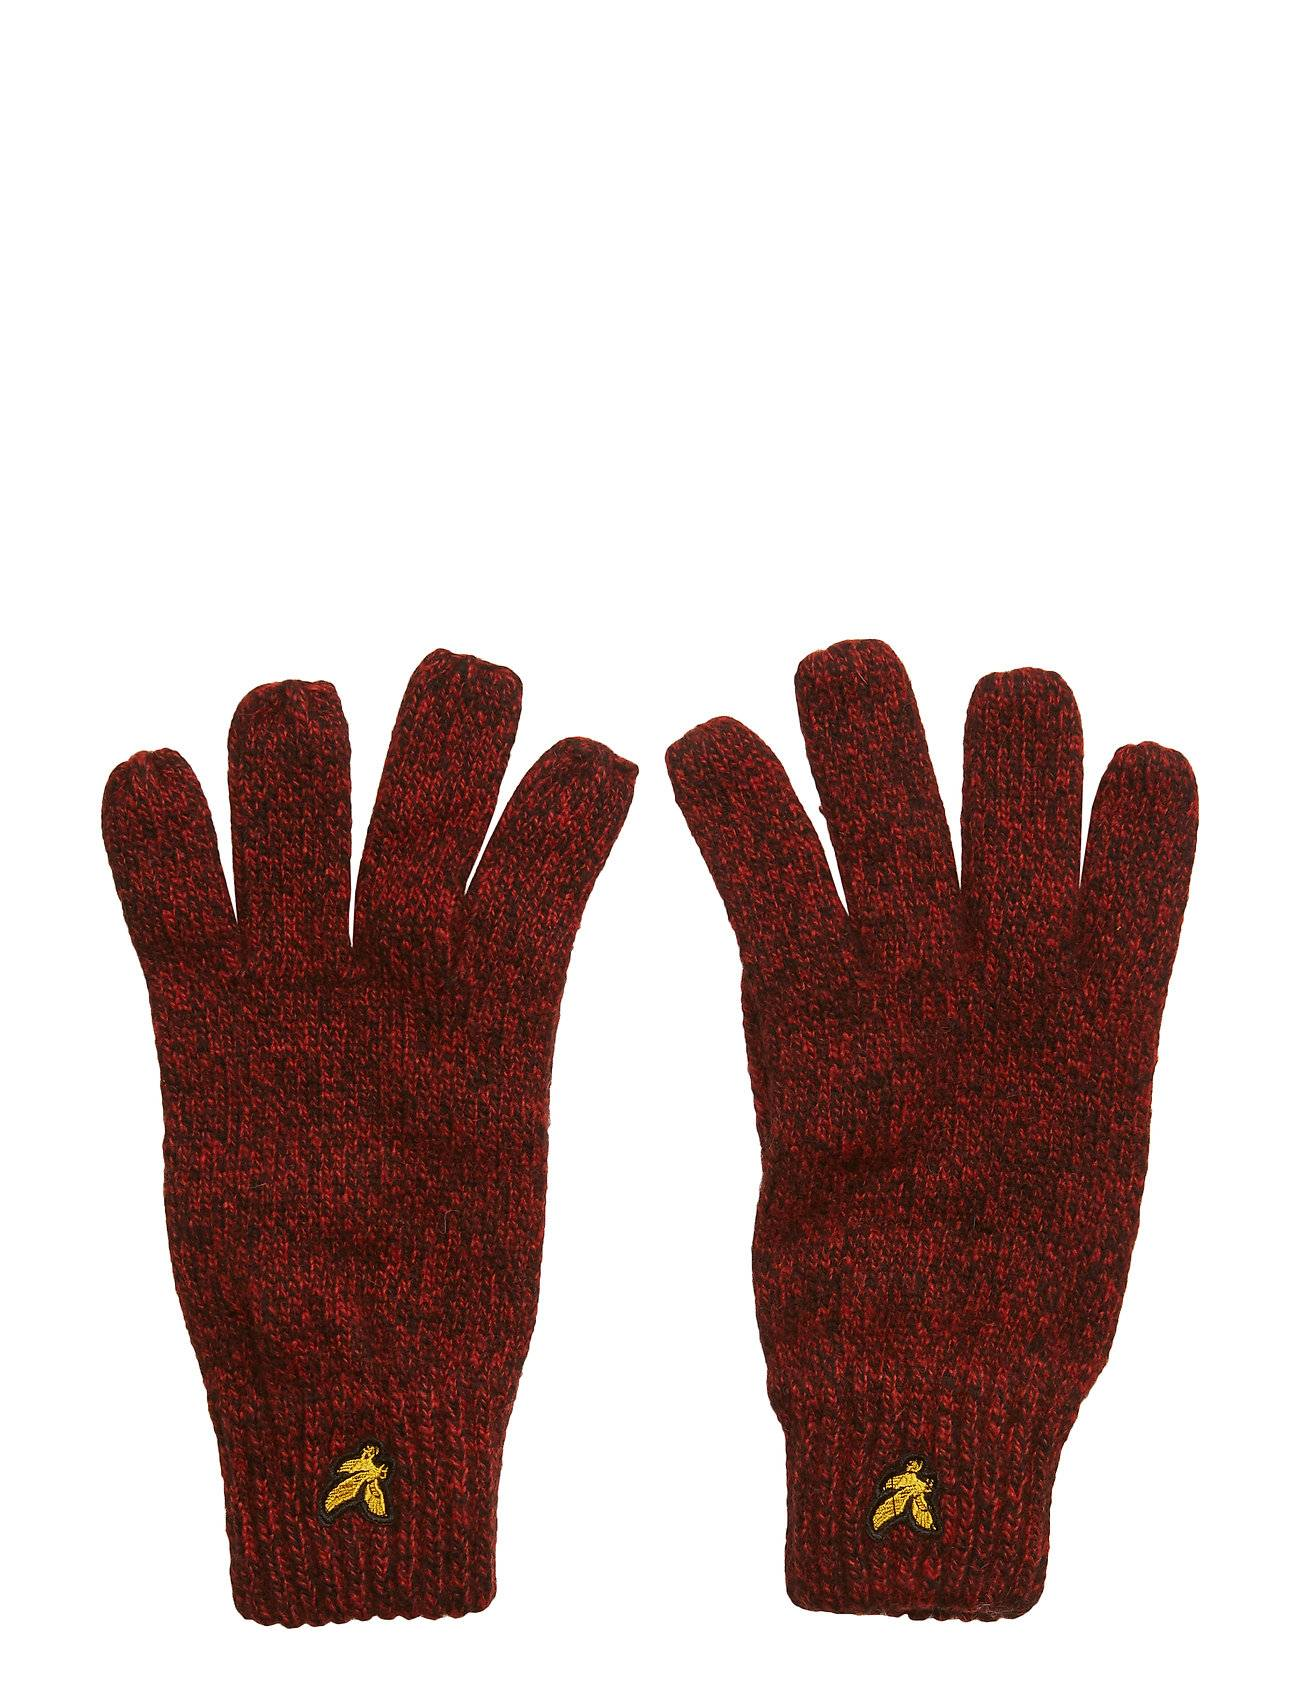 Scott Mouline Gloves